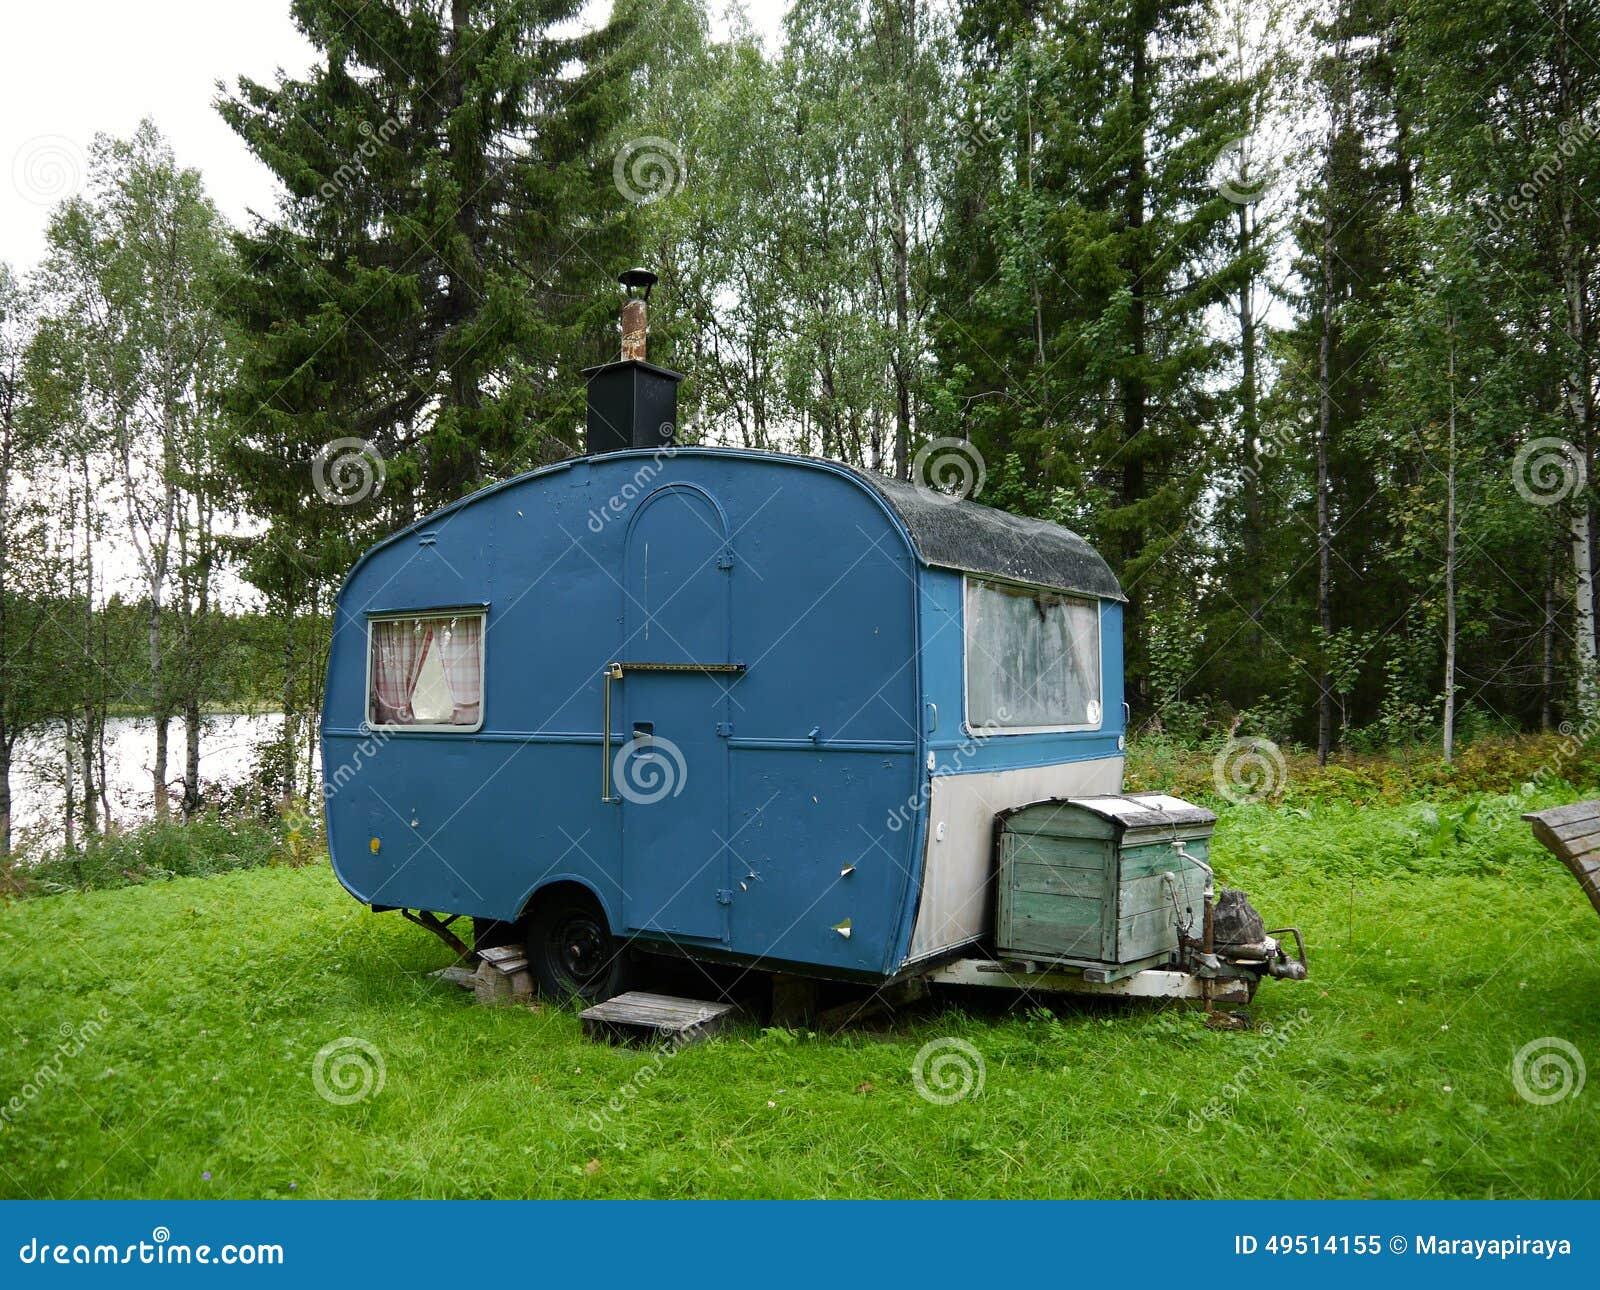 caravane de vintage image stock image du vieux verrouill 49514155. Black Bedroom Furniture Sets. Home Design Ideas